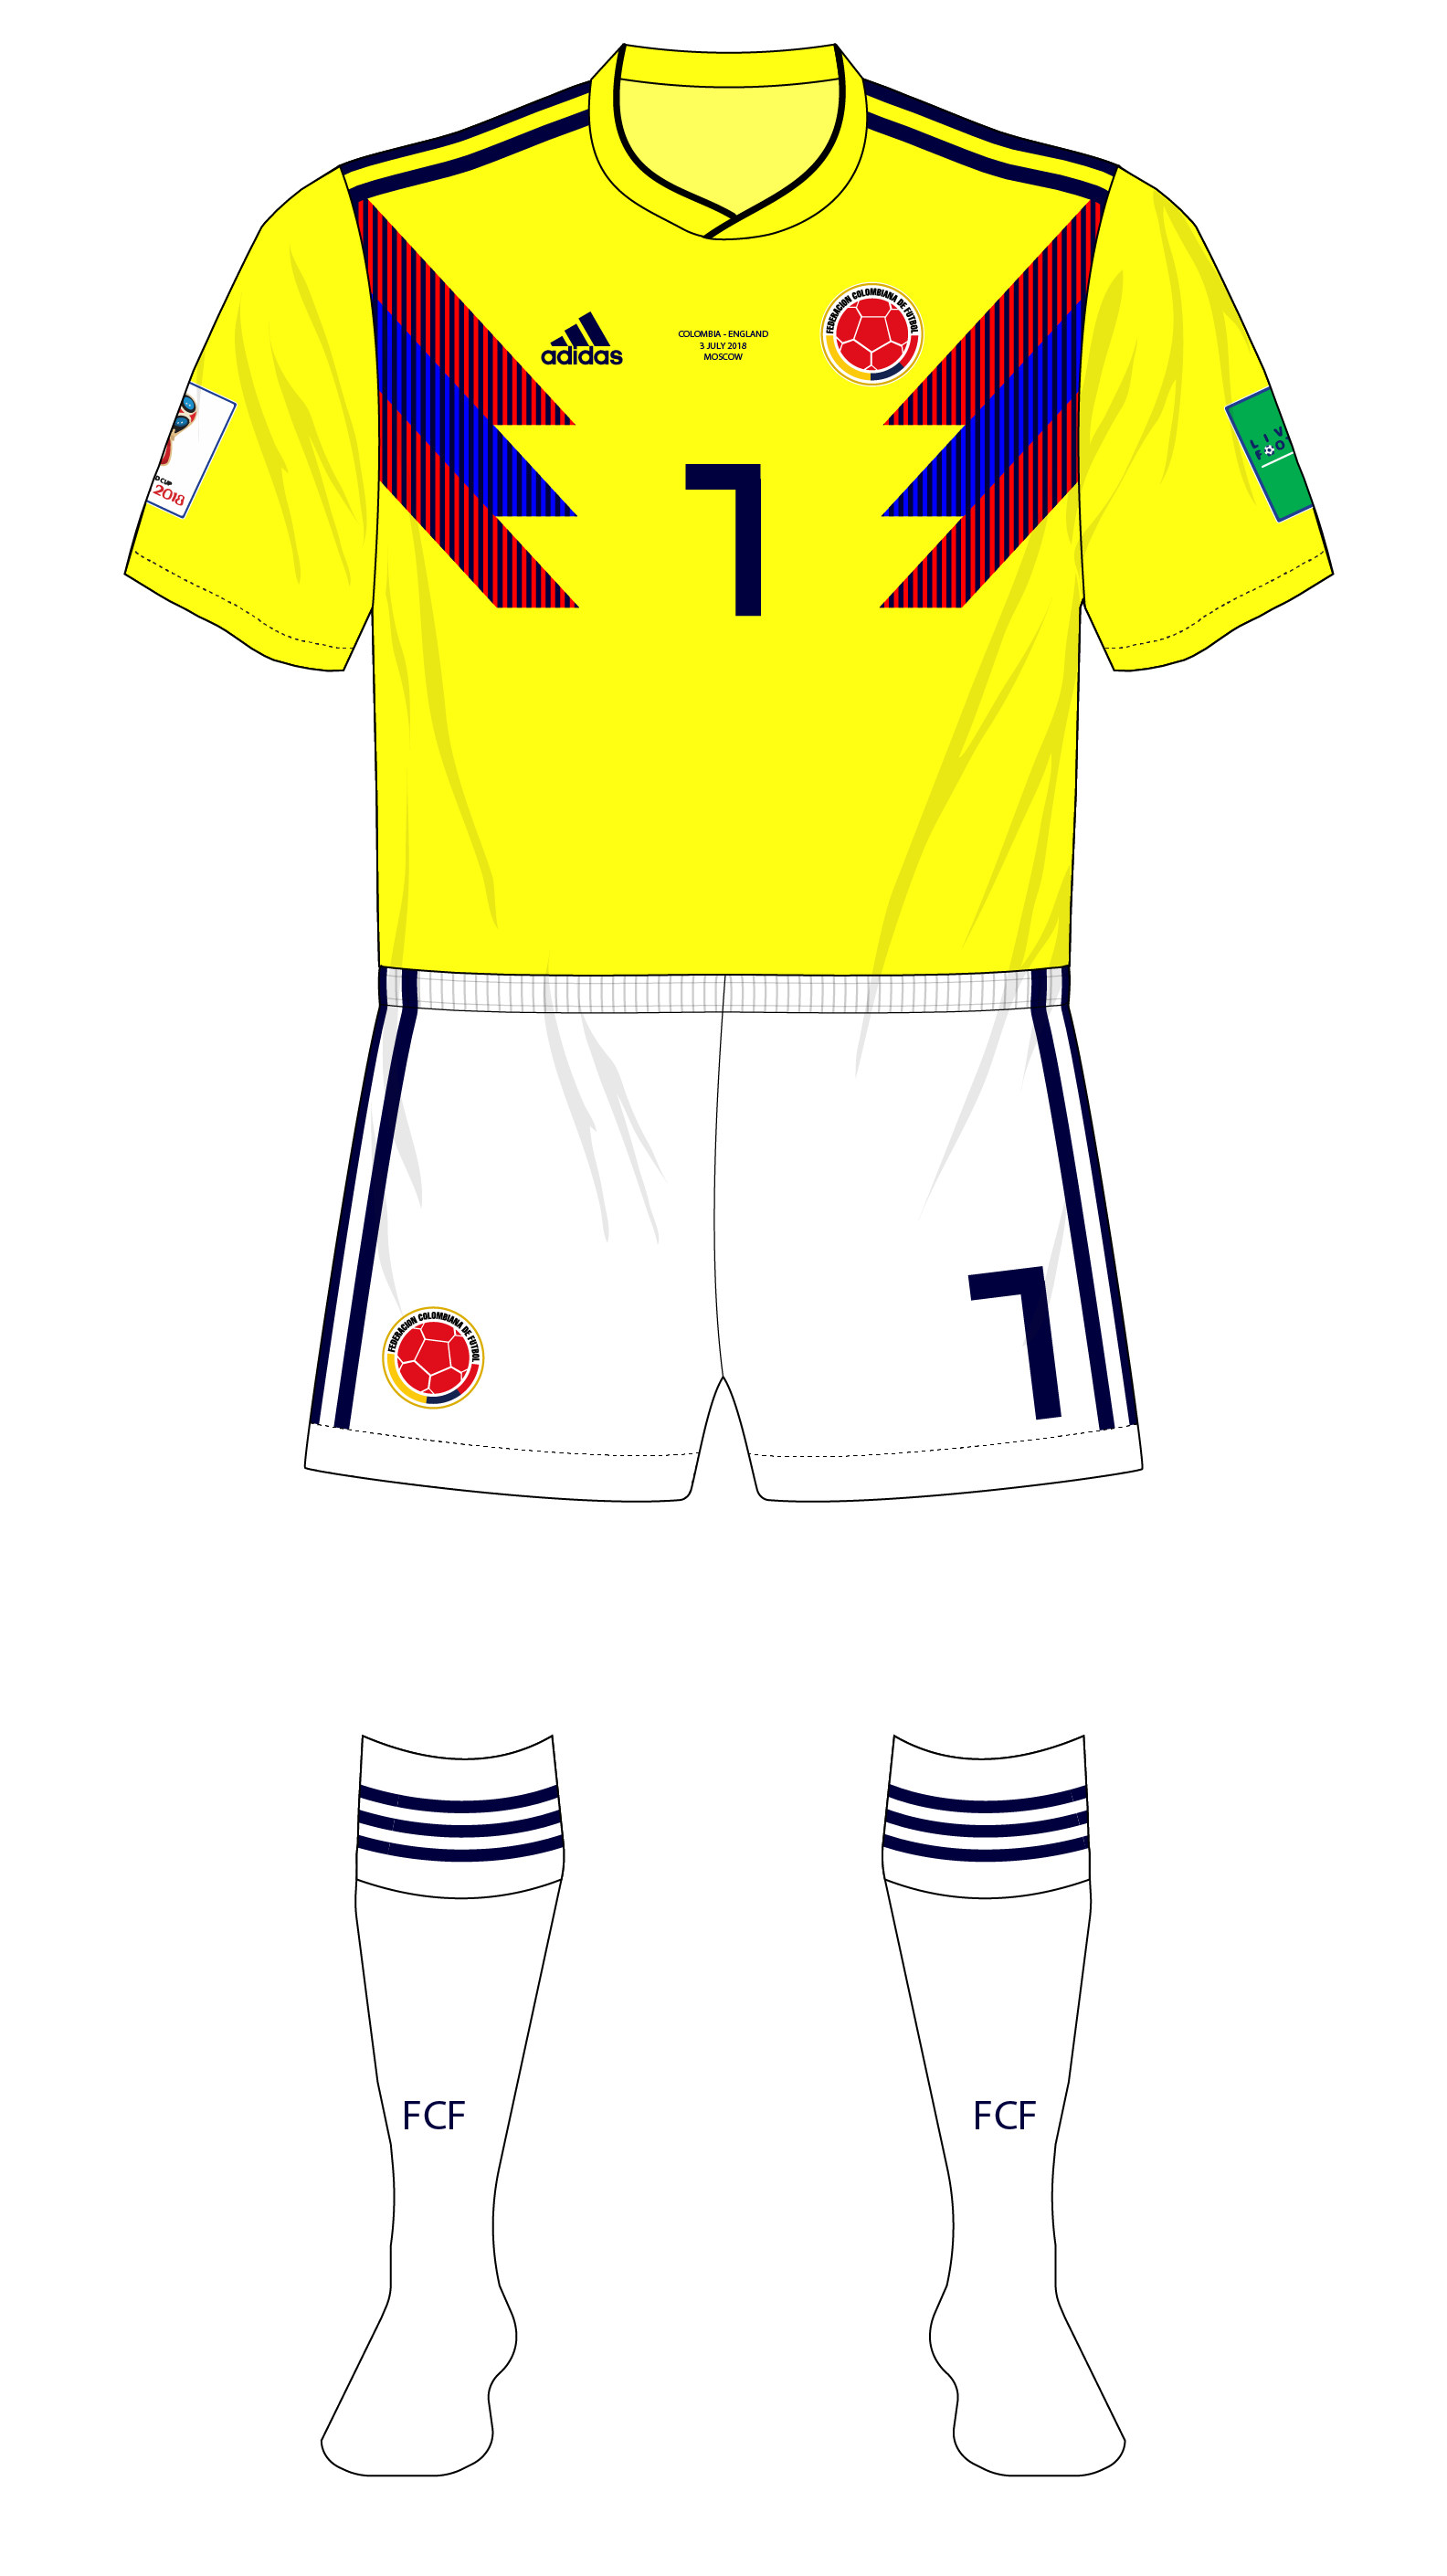 cdeae8c123 Colombia adidas camiseta copa mundial england museum of jerseys png  1584x2820 Camisetas adidas copa mundial